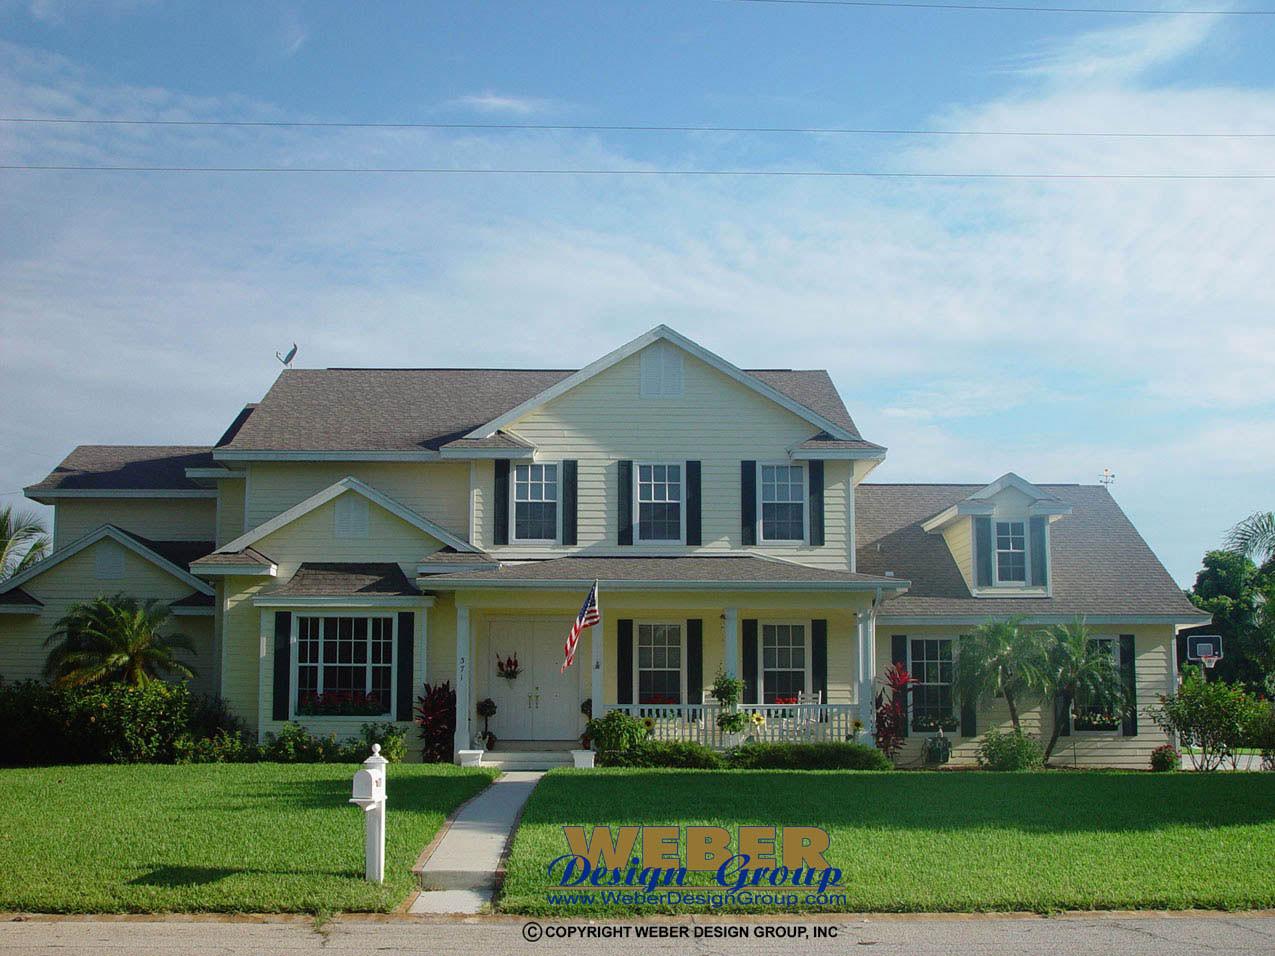 Florida house plan st james home plan weber design group for Small florida home plans